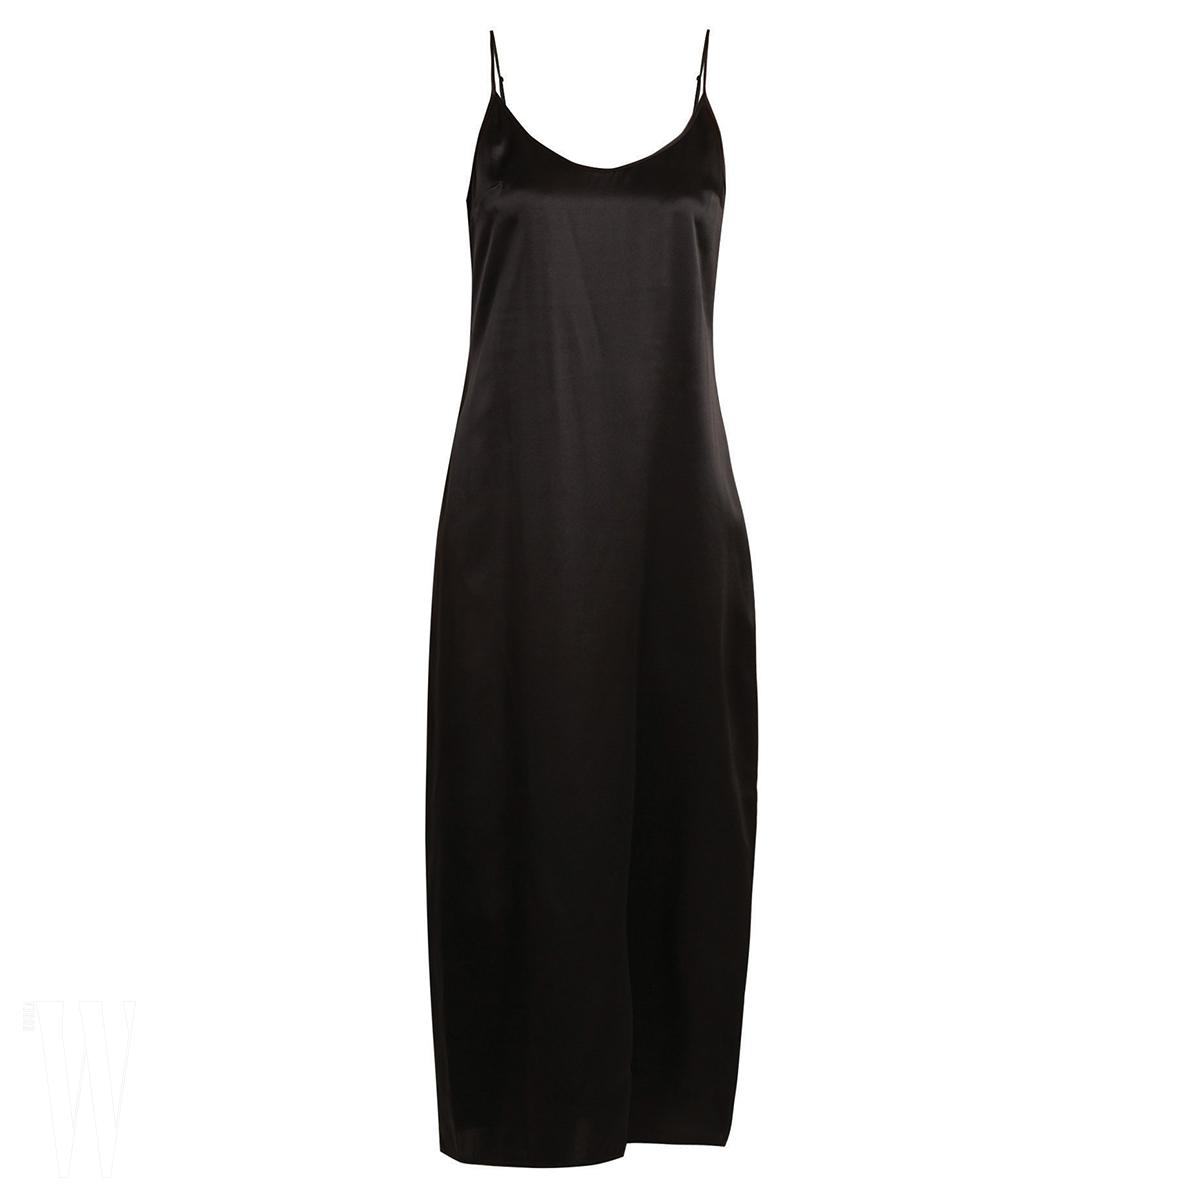 LA PERLA 미니멀한 슬립 드레스는 라펠라 제품. 16만원대.